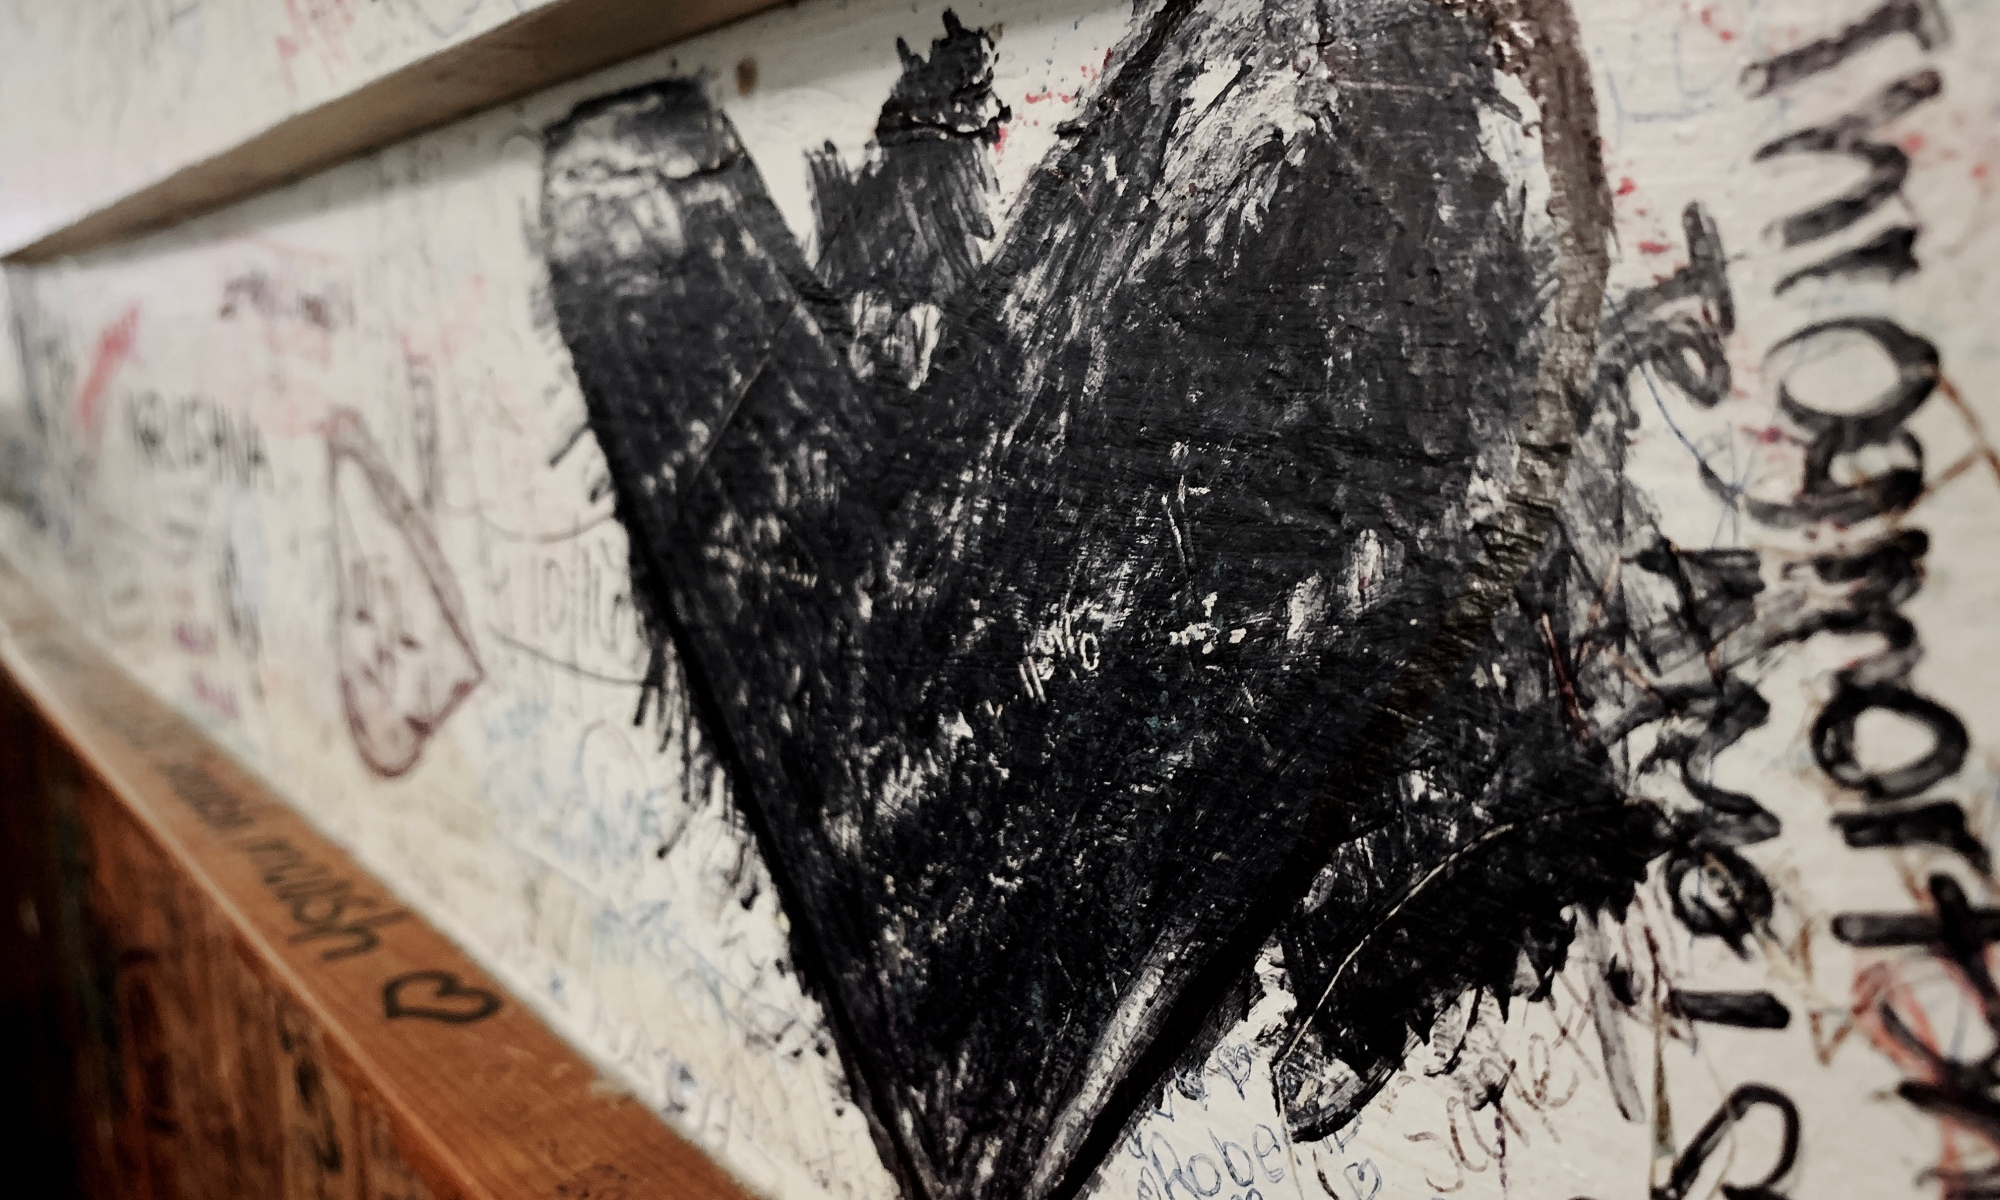 Black heart graffiti on wall at local pizzeria.